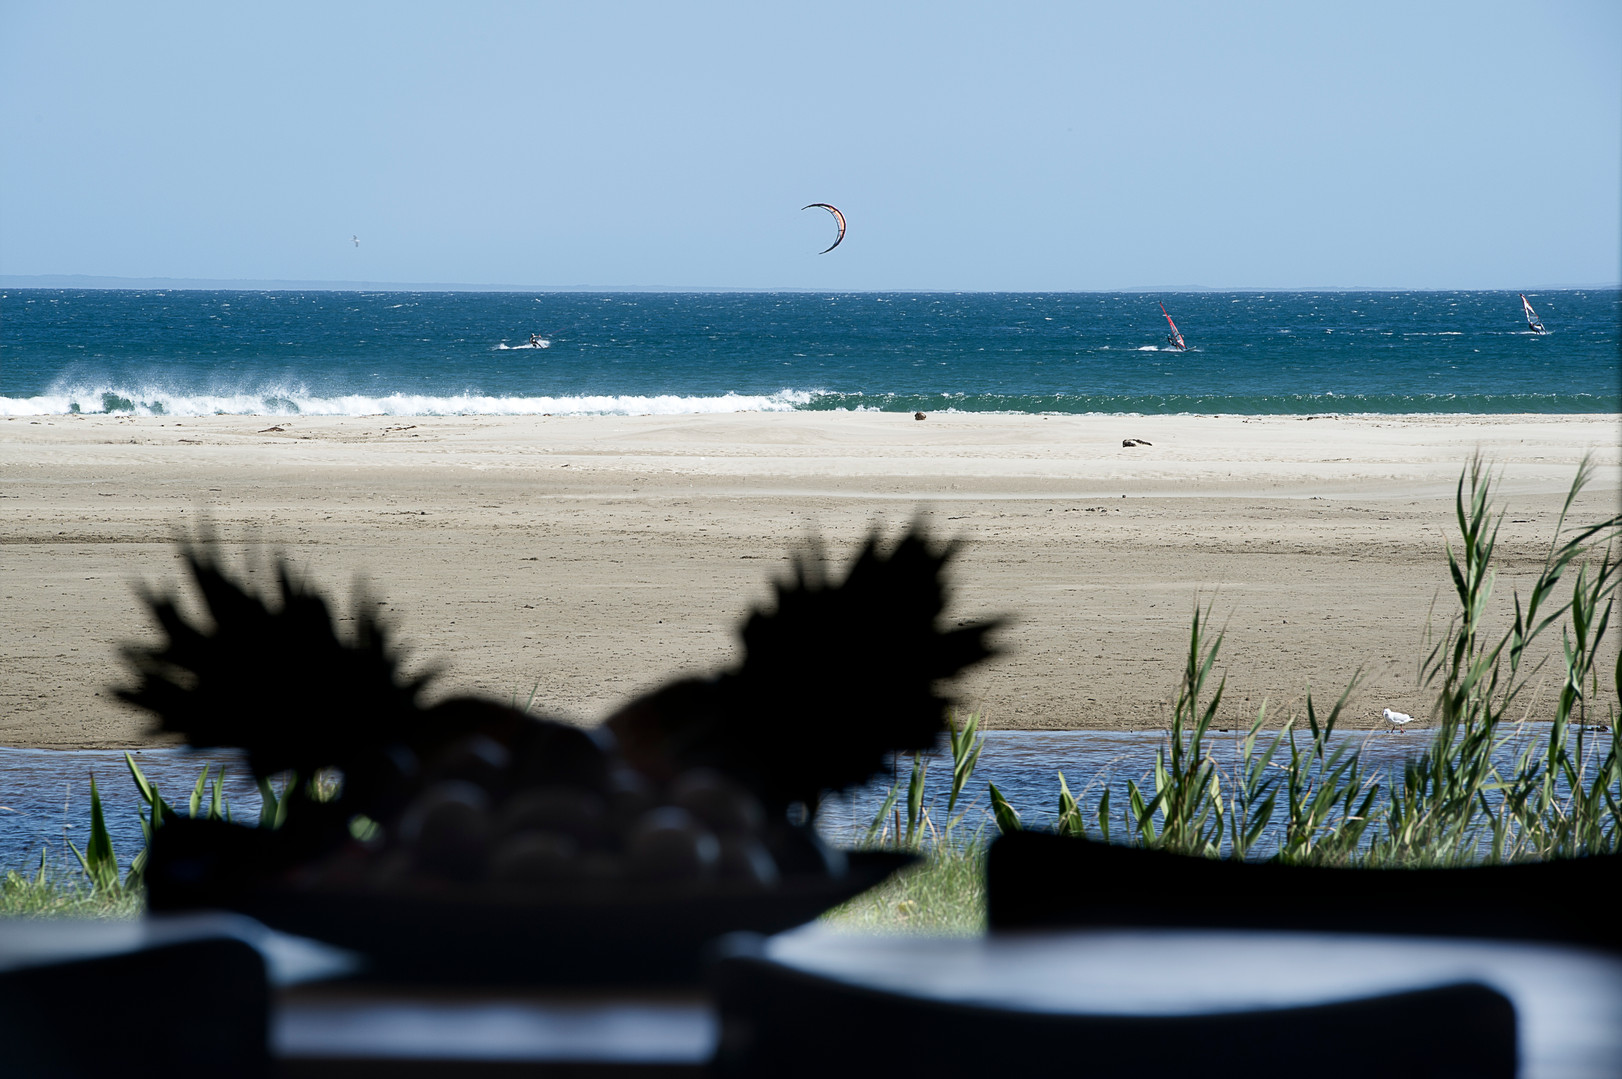 The Beach House - Karen Akers